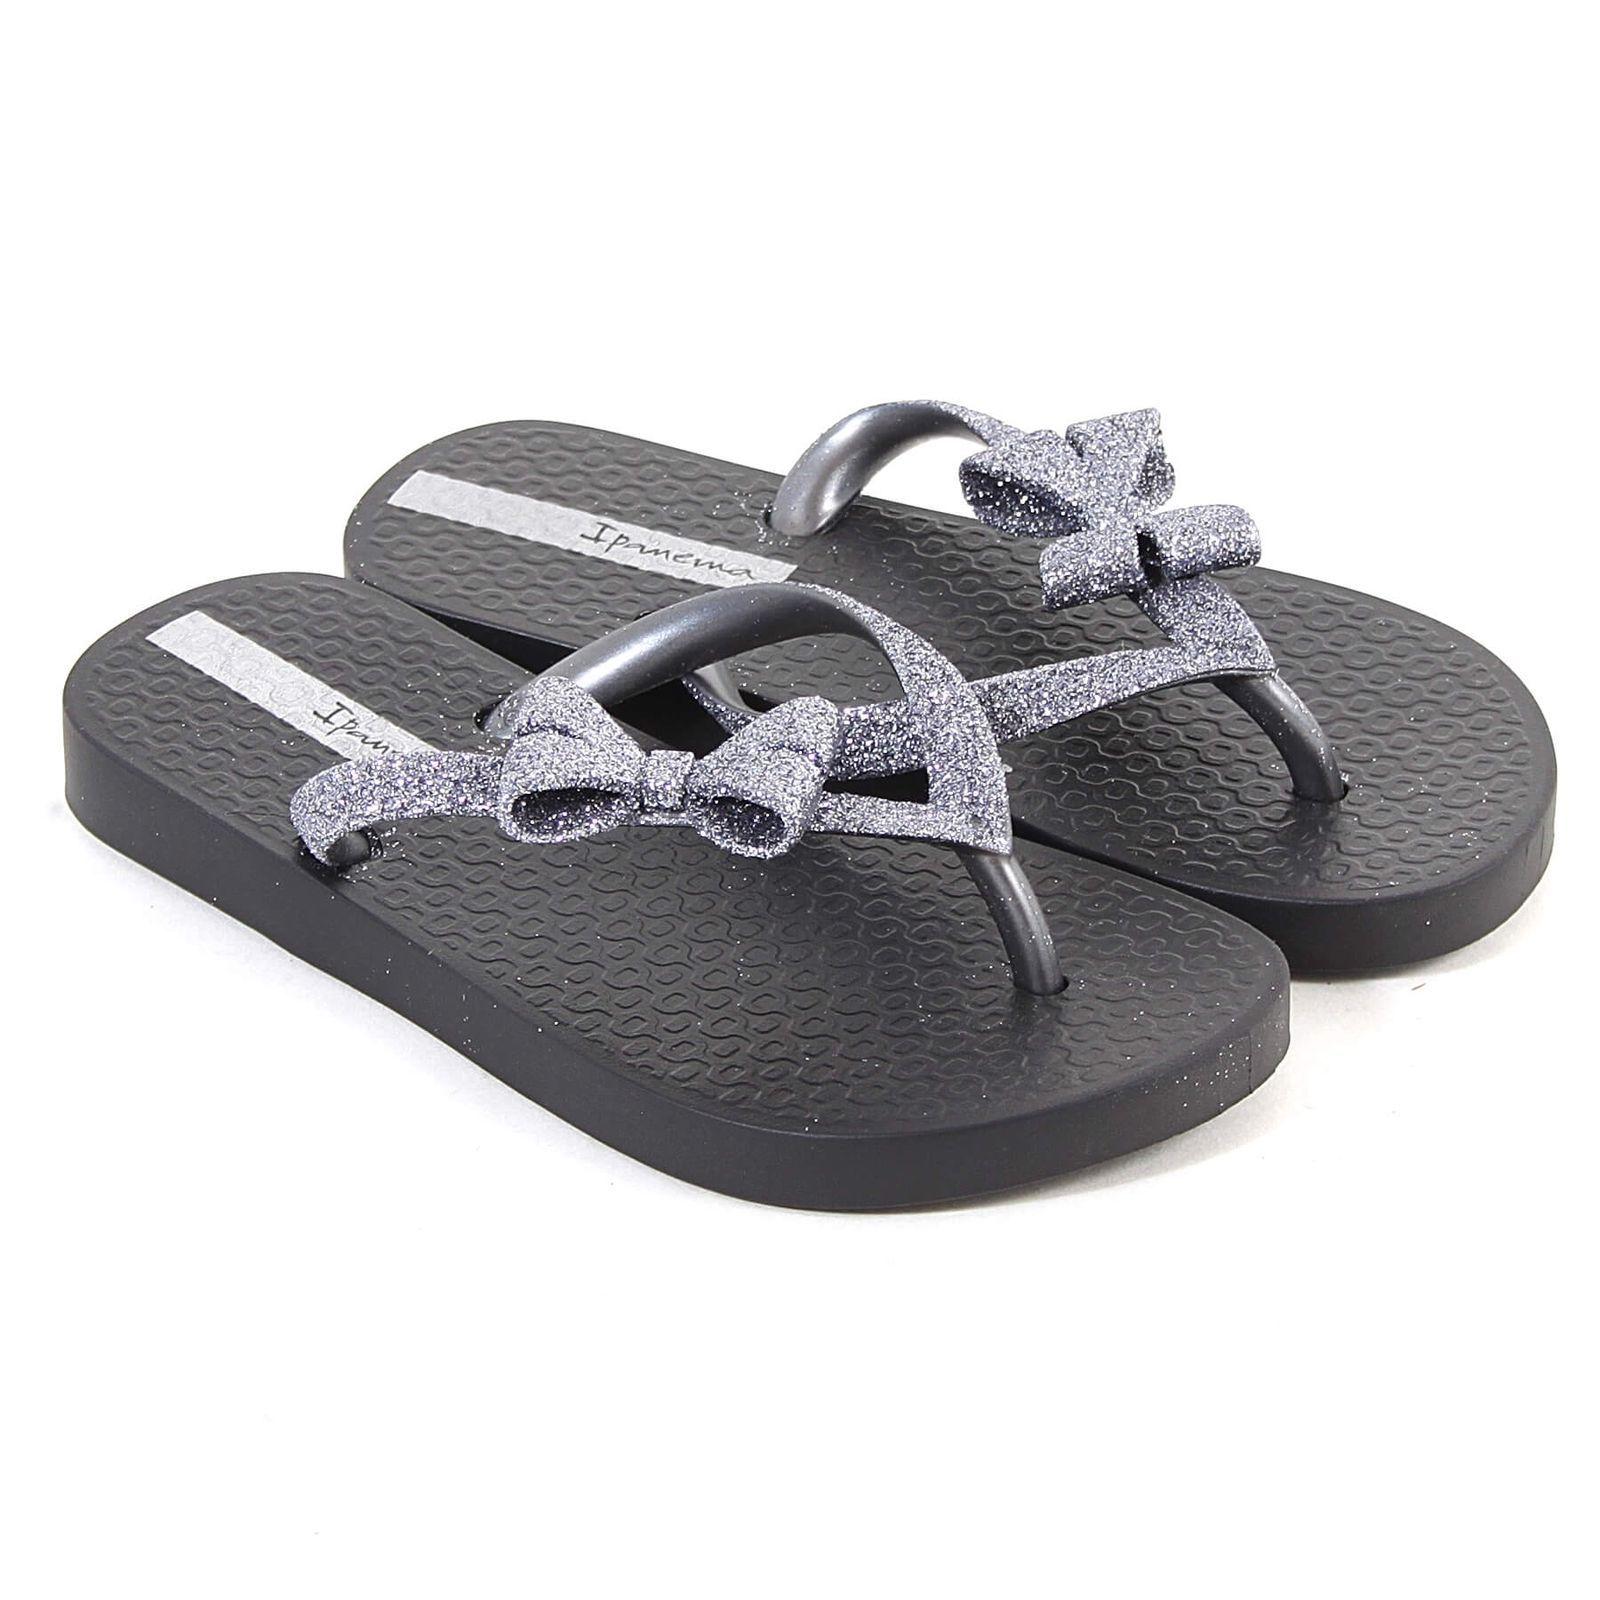 0419a913f119 Glitter Flip Flops Beach Sandals in Wide Colours  beach  slipper footwear thongs vincent fzferdun.com